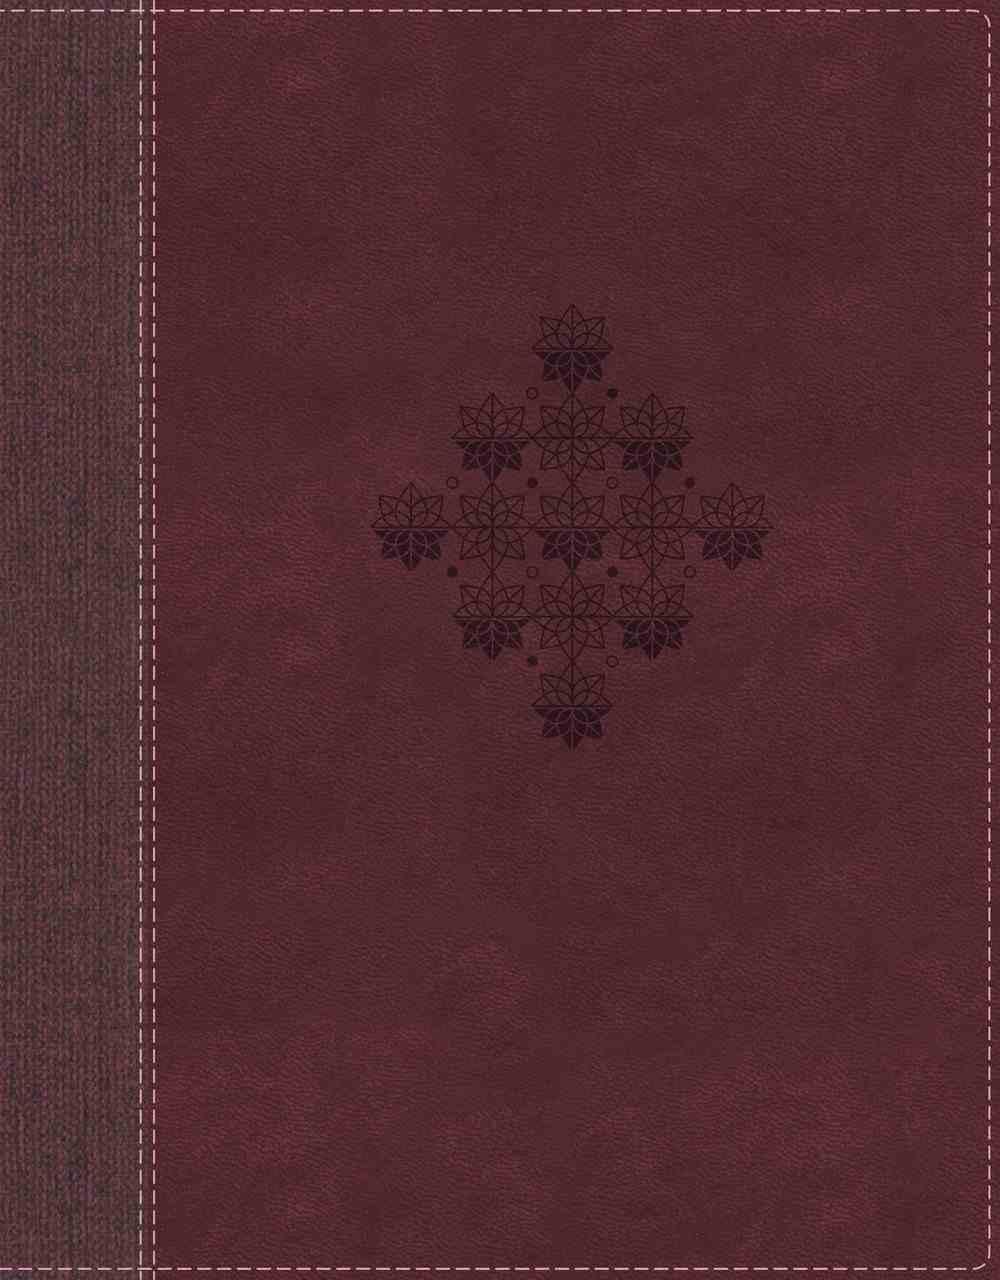 NRSV Journal the Word Bible Burgundy Premium Imitation Leather